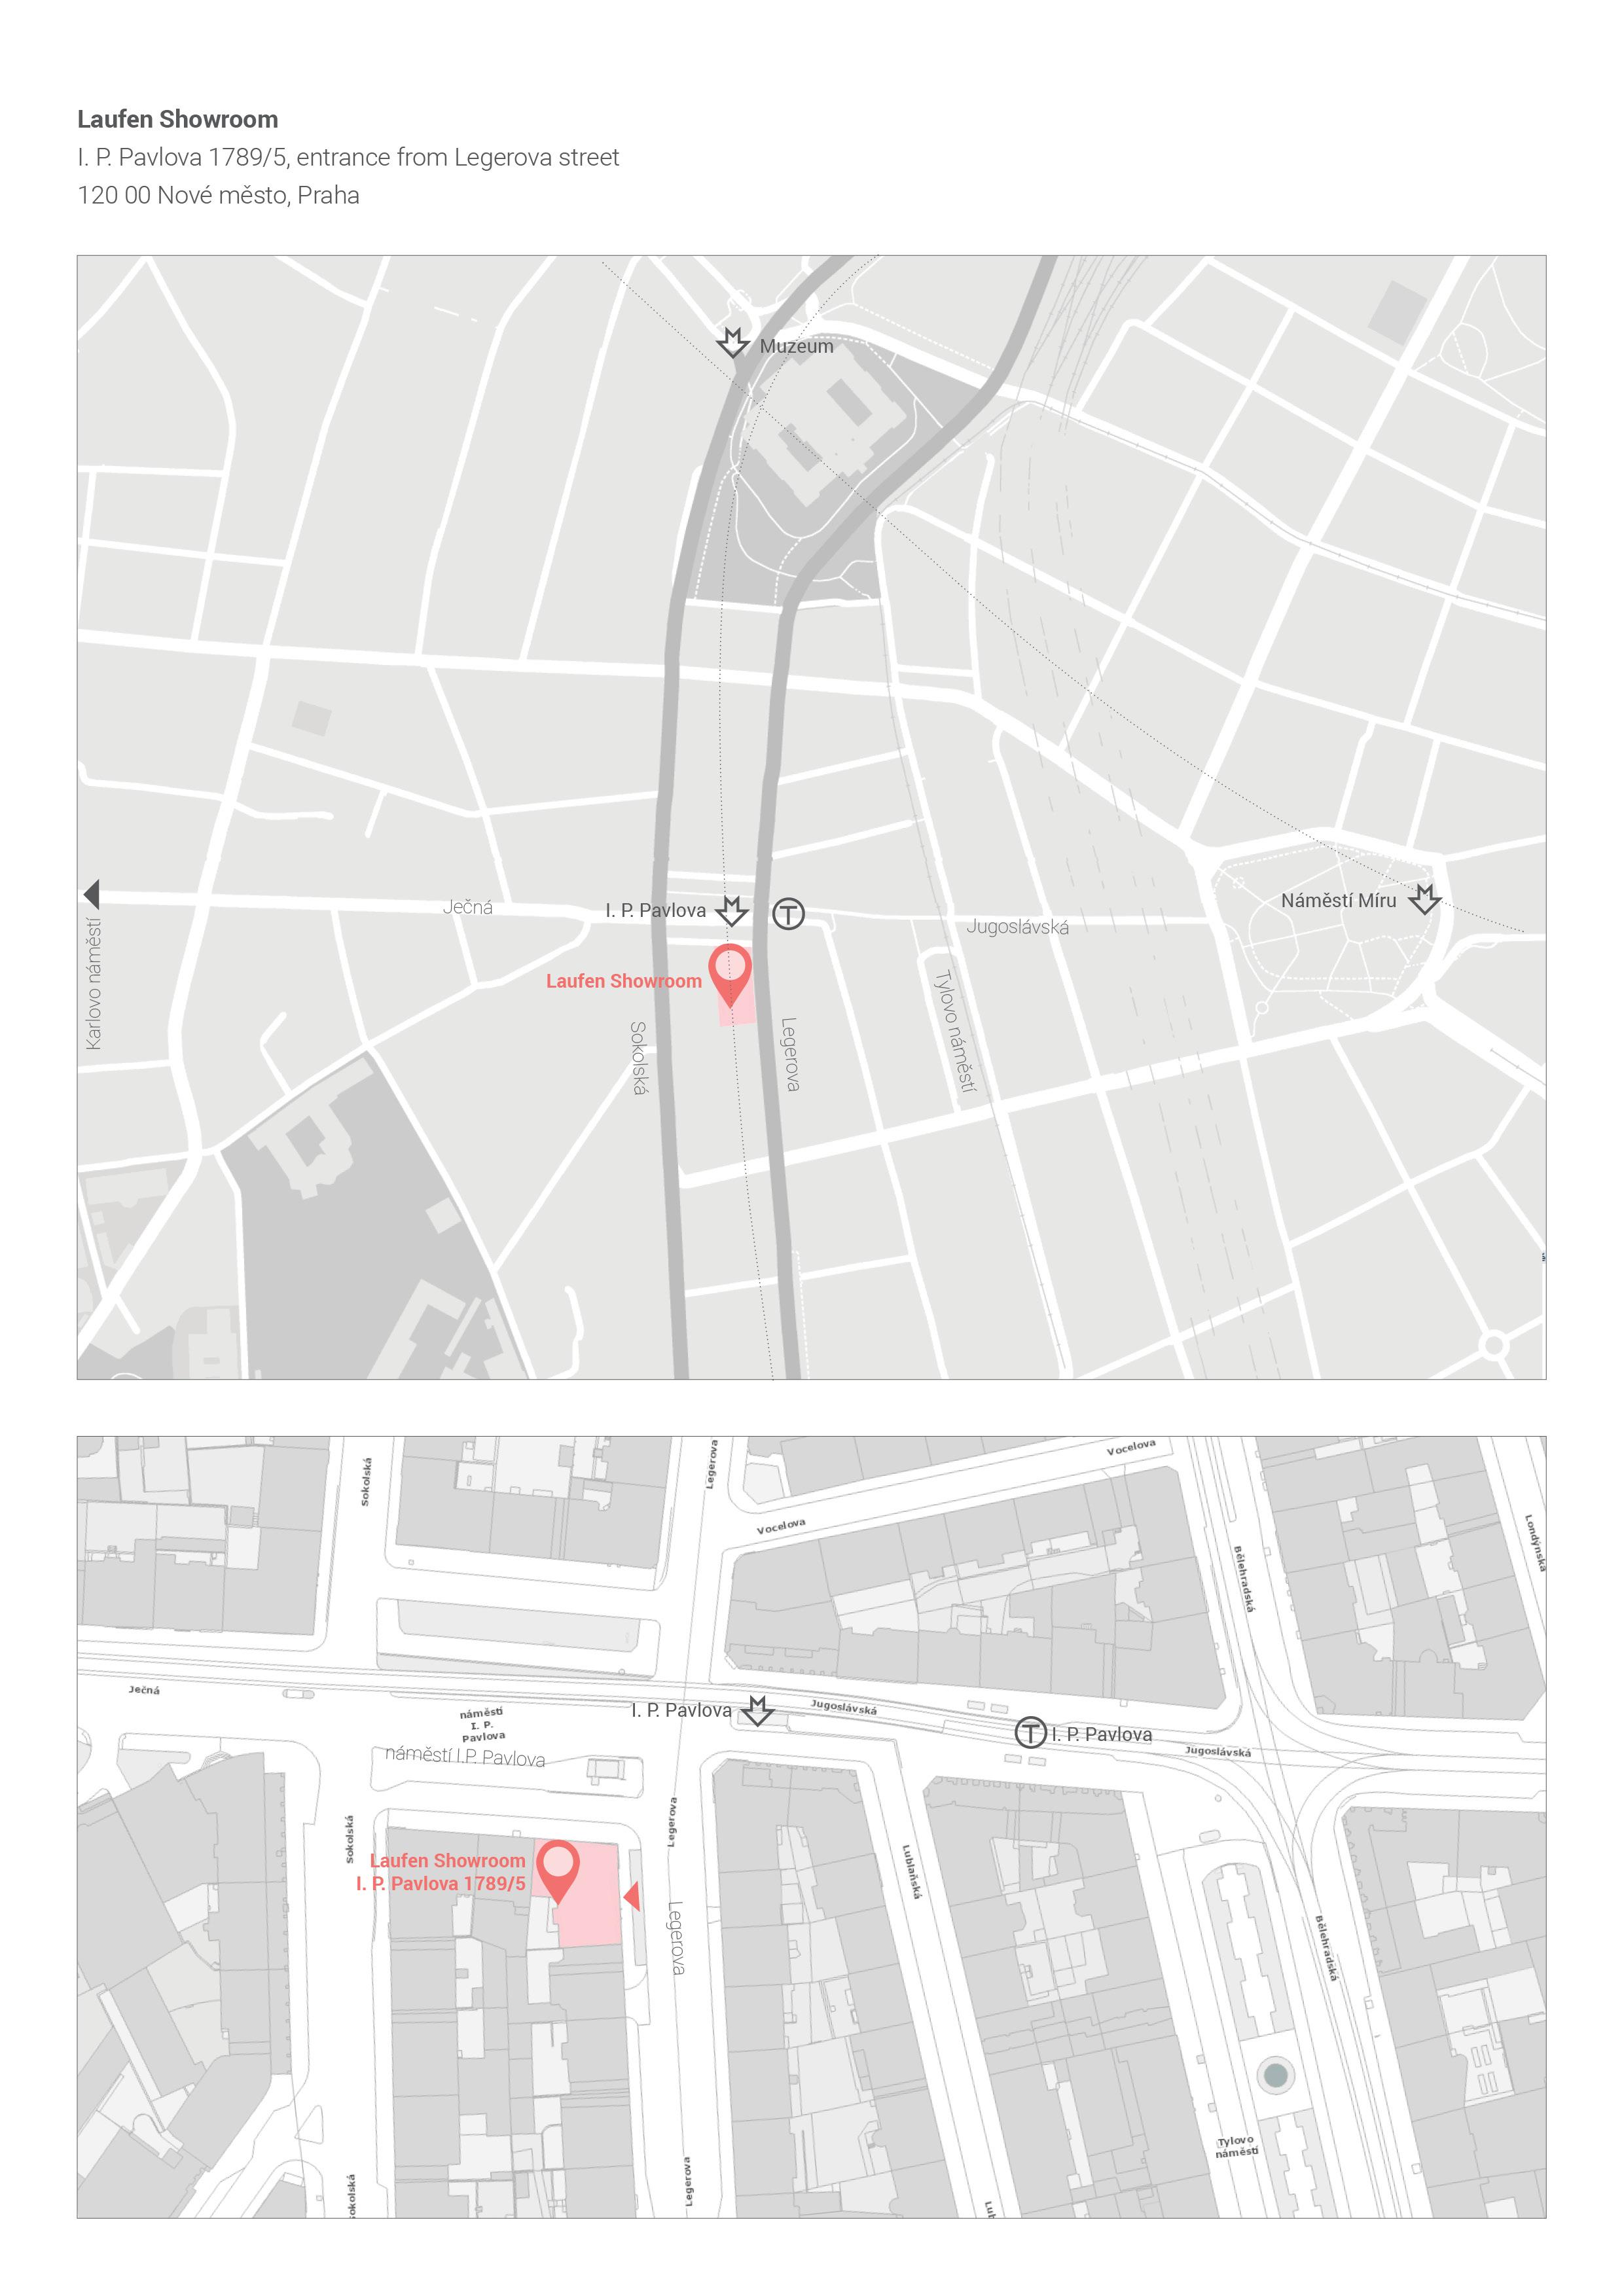 AIA_Prague_locations-17-09-295.jpg